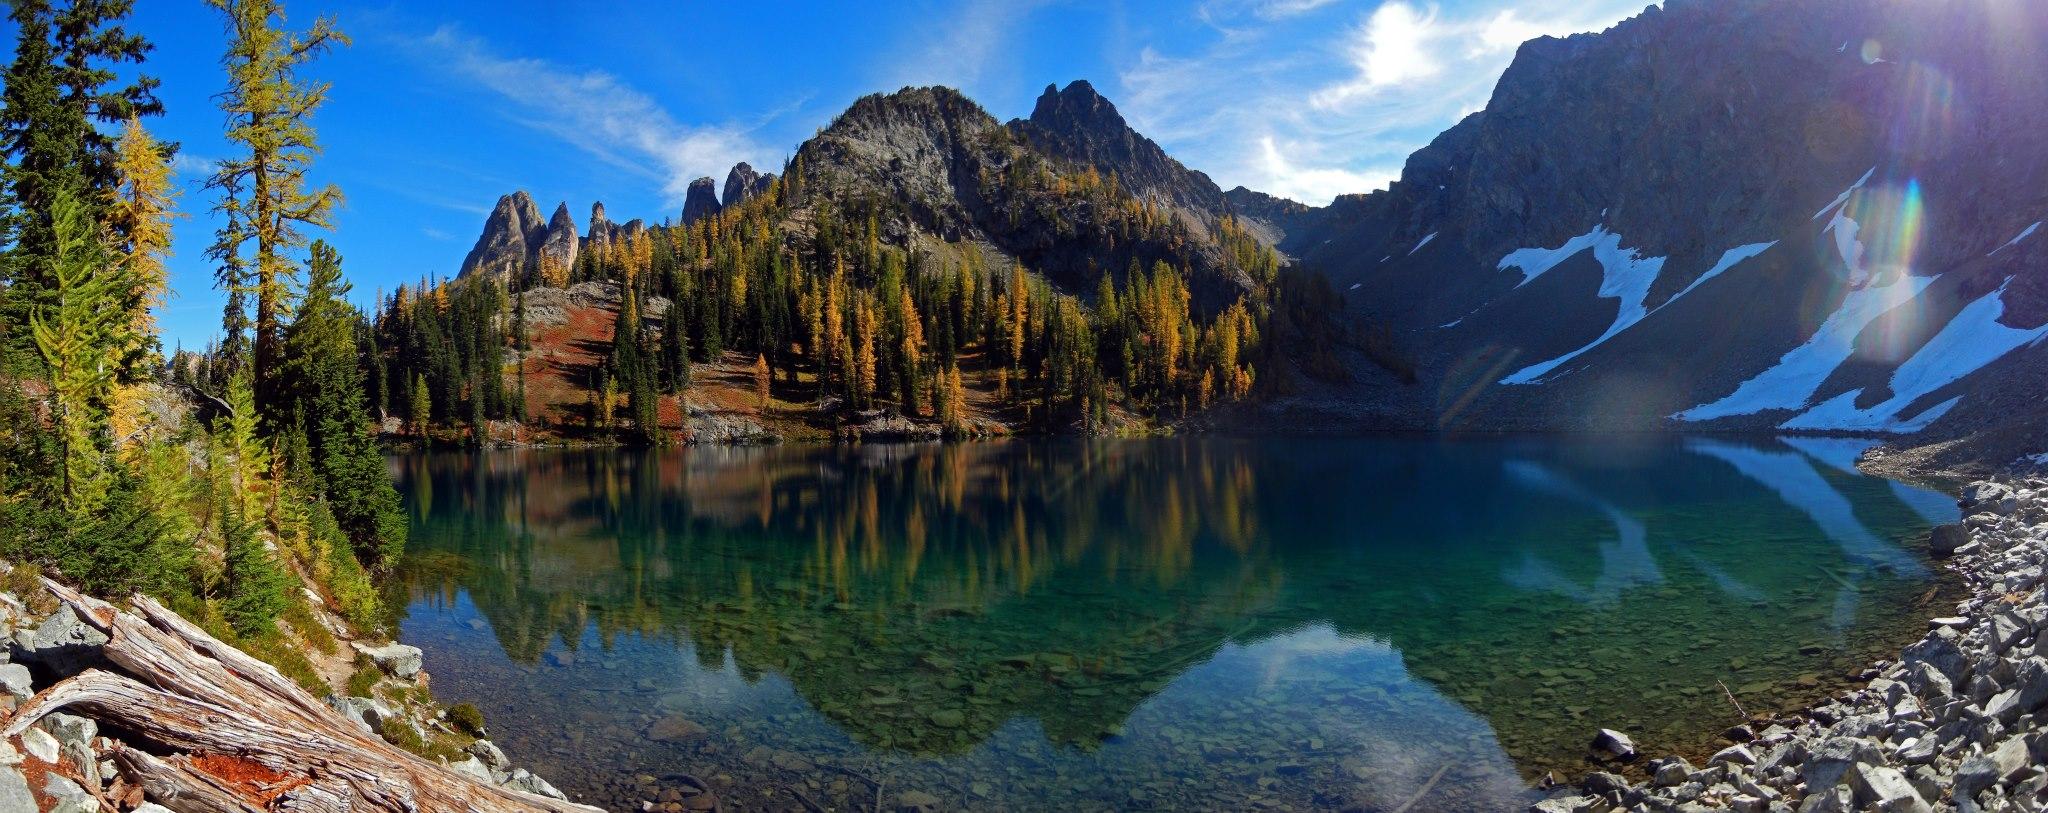 Blue Lake, North Cascades, Washington, USA